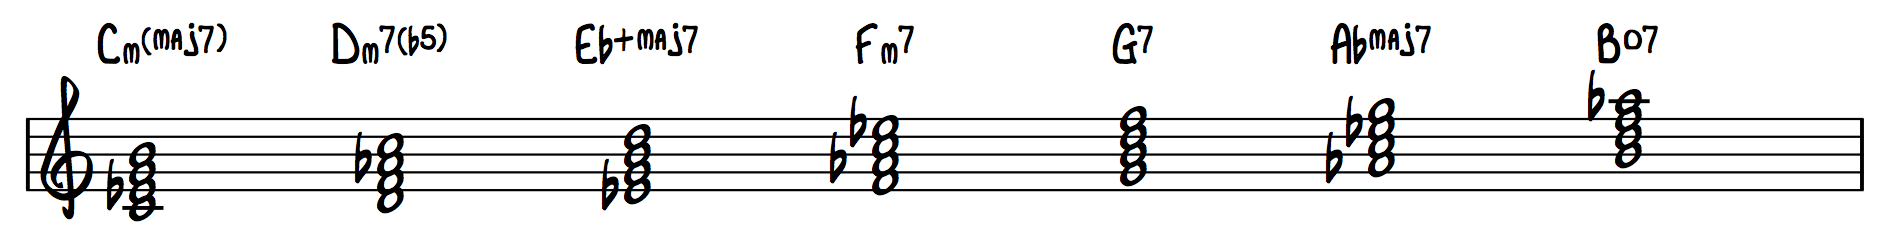 17 - C Harmonic Minor Chords